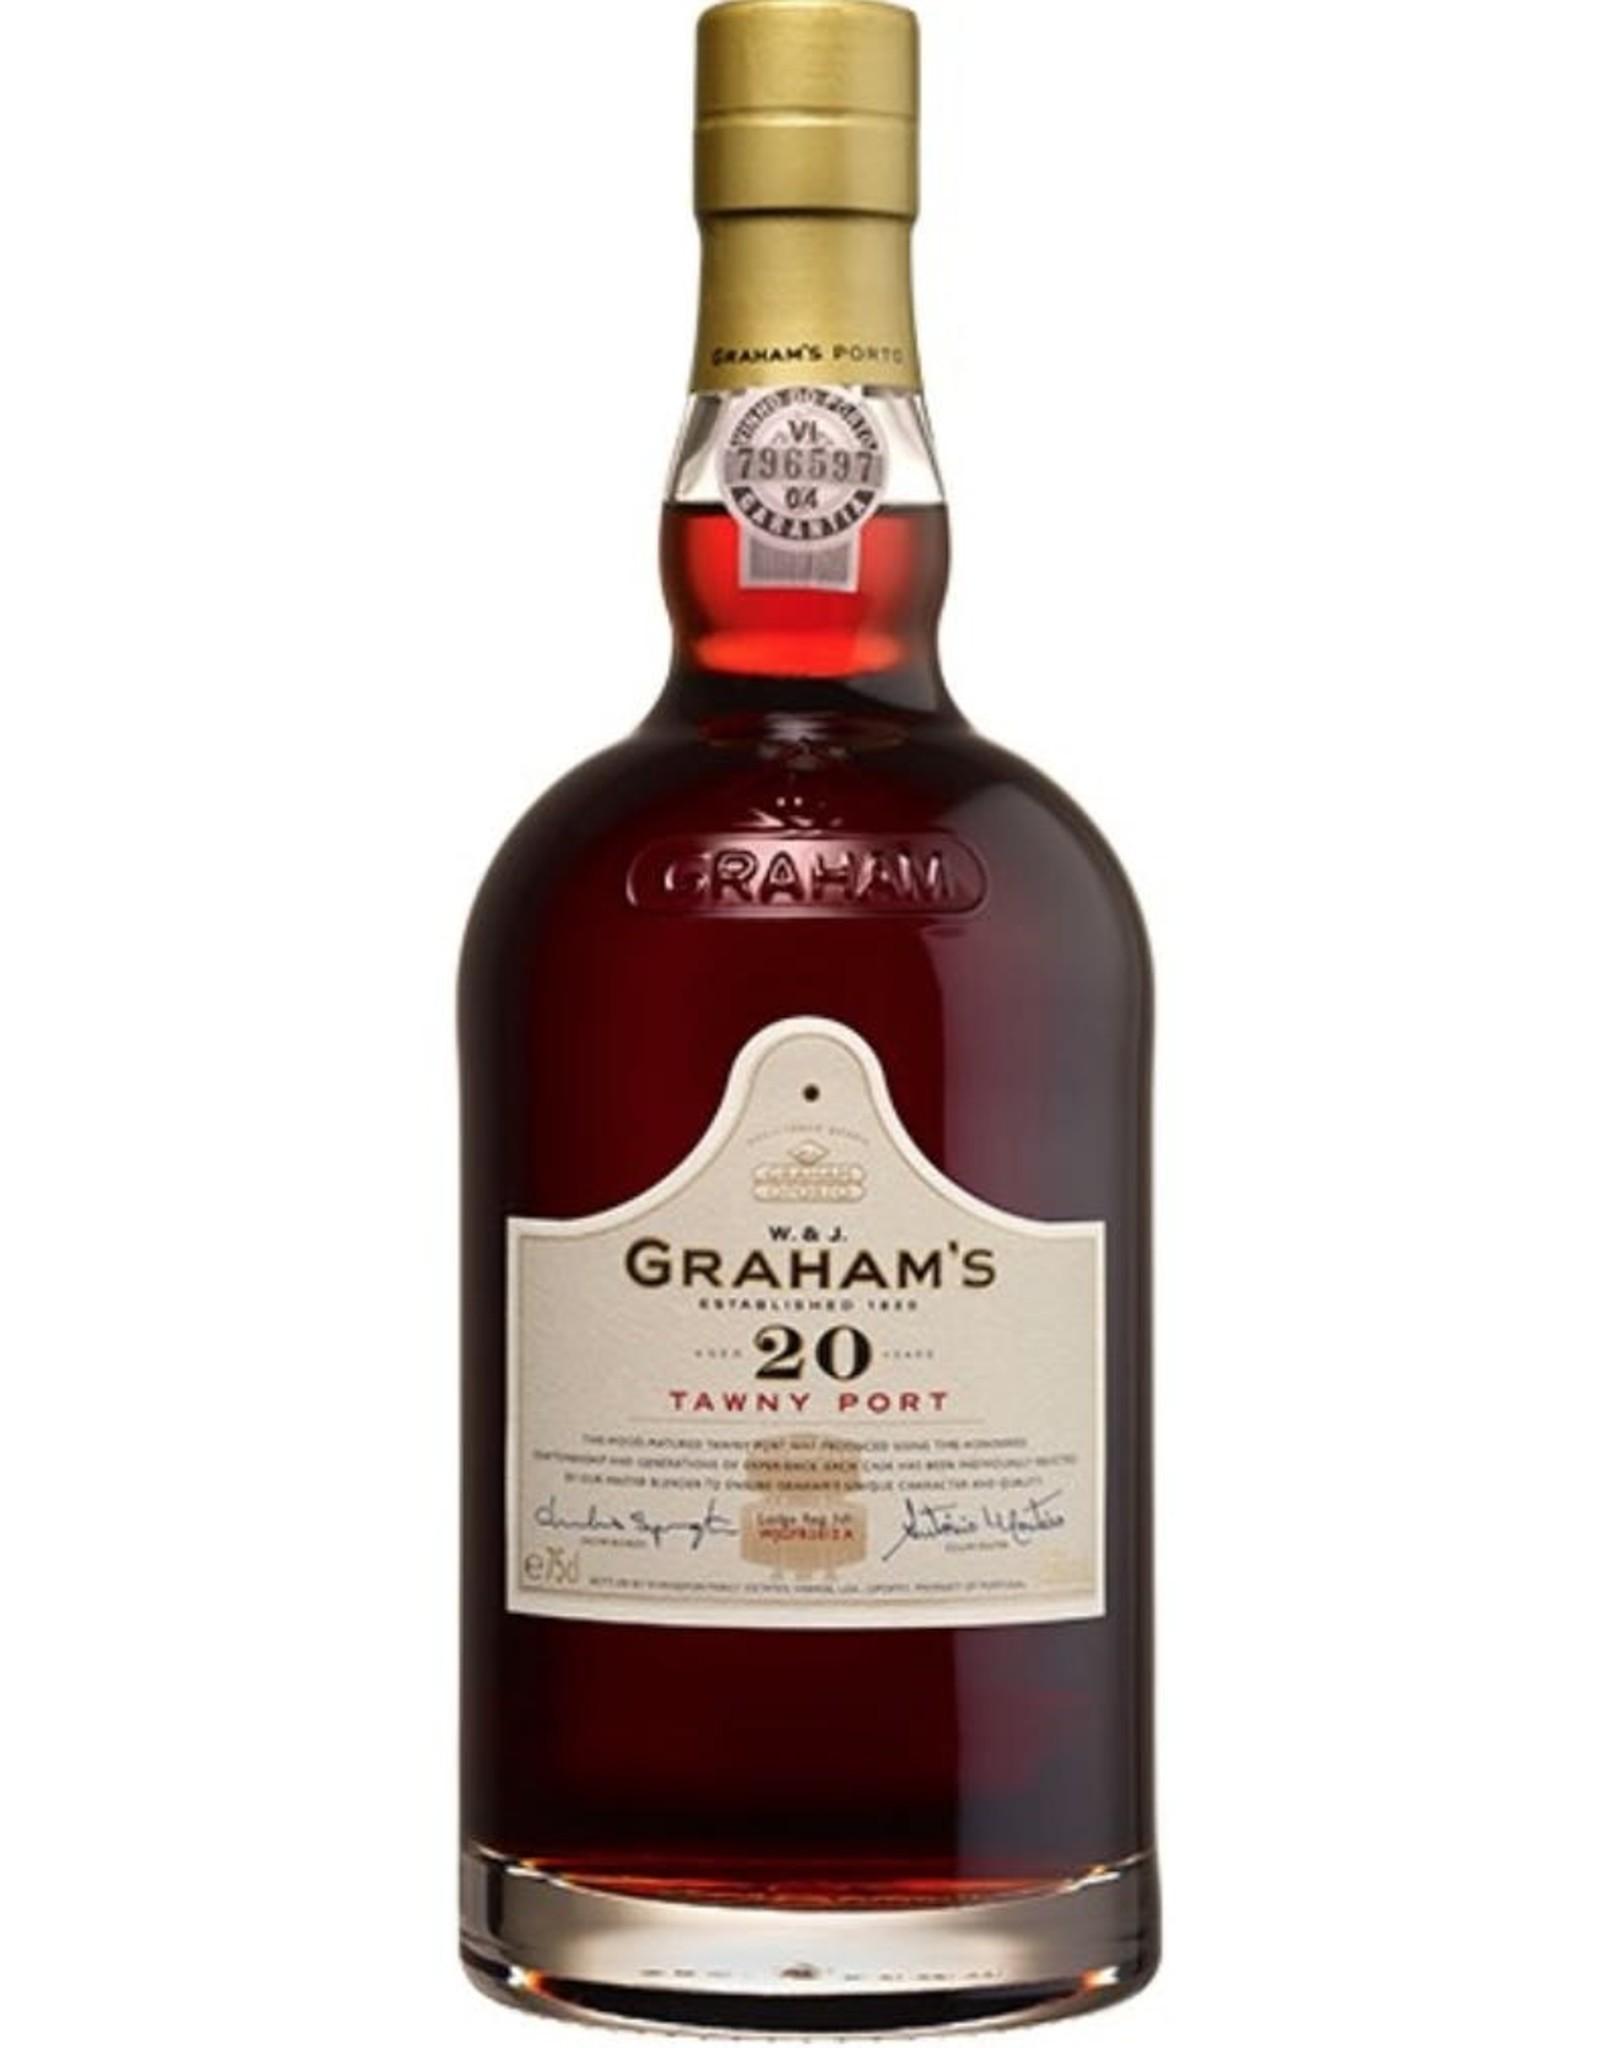 Graham's 20 Year Old Tawny Porto